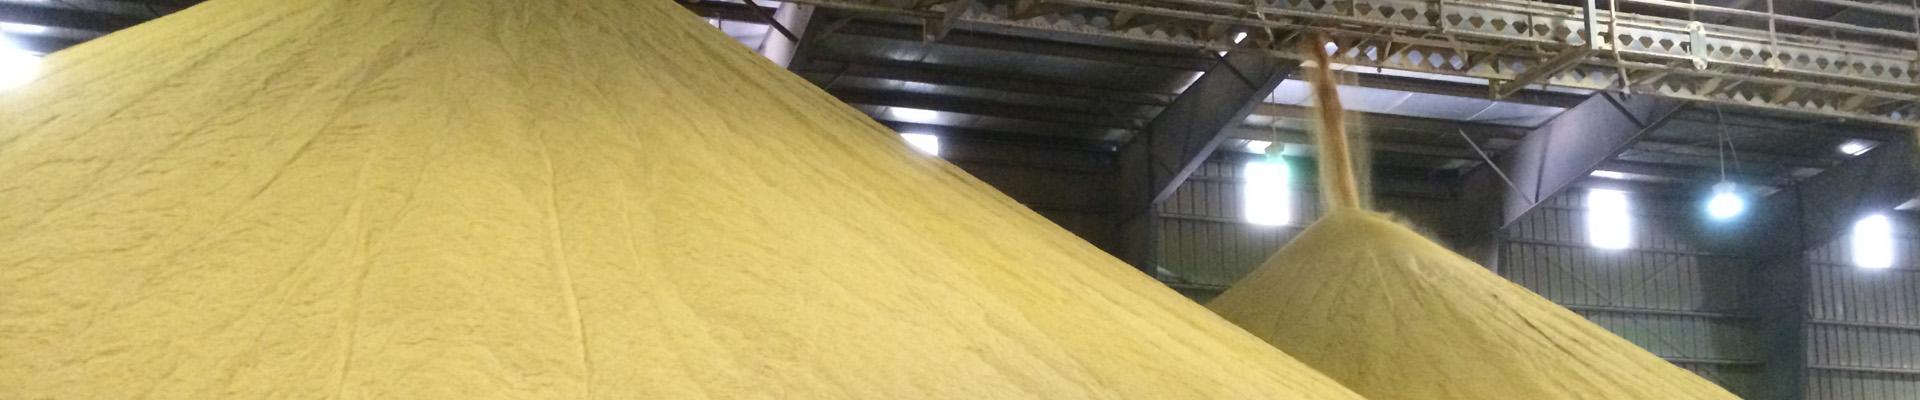 Distillers Grains